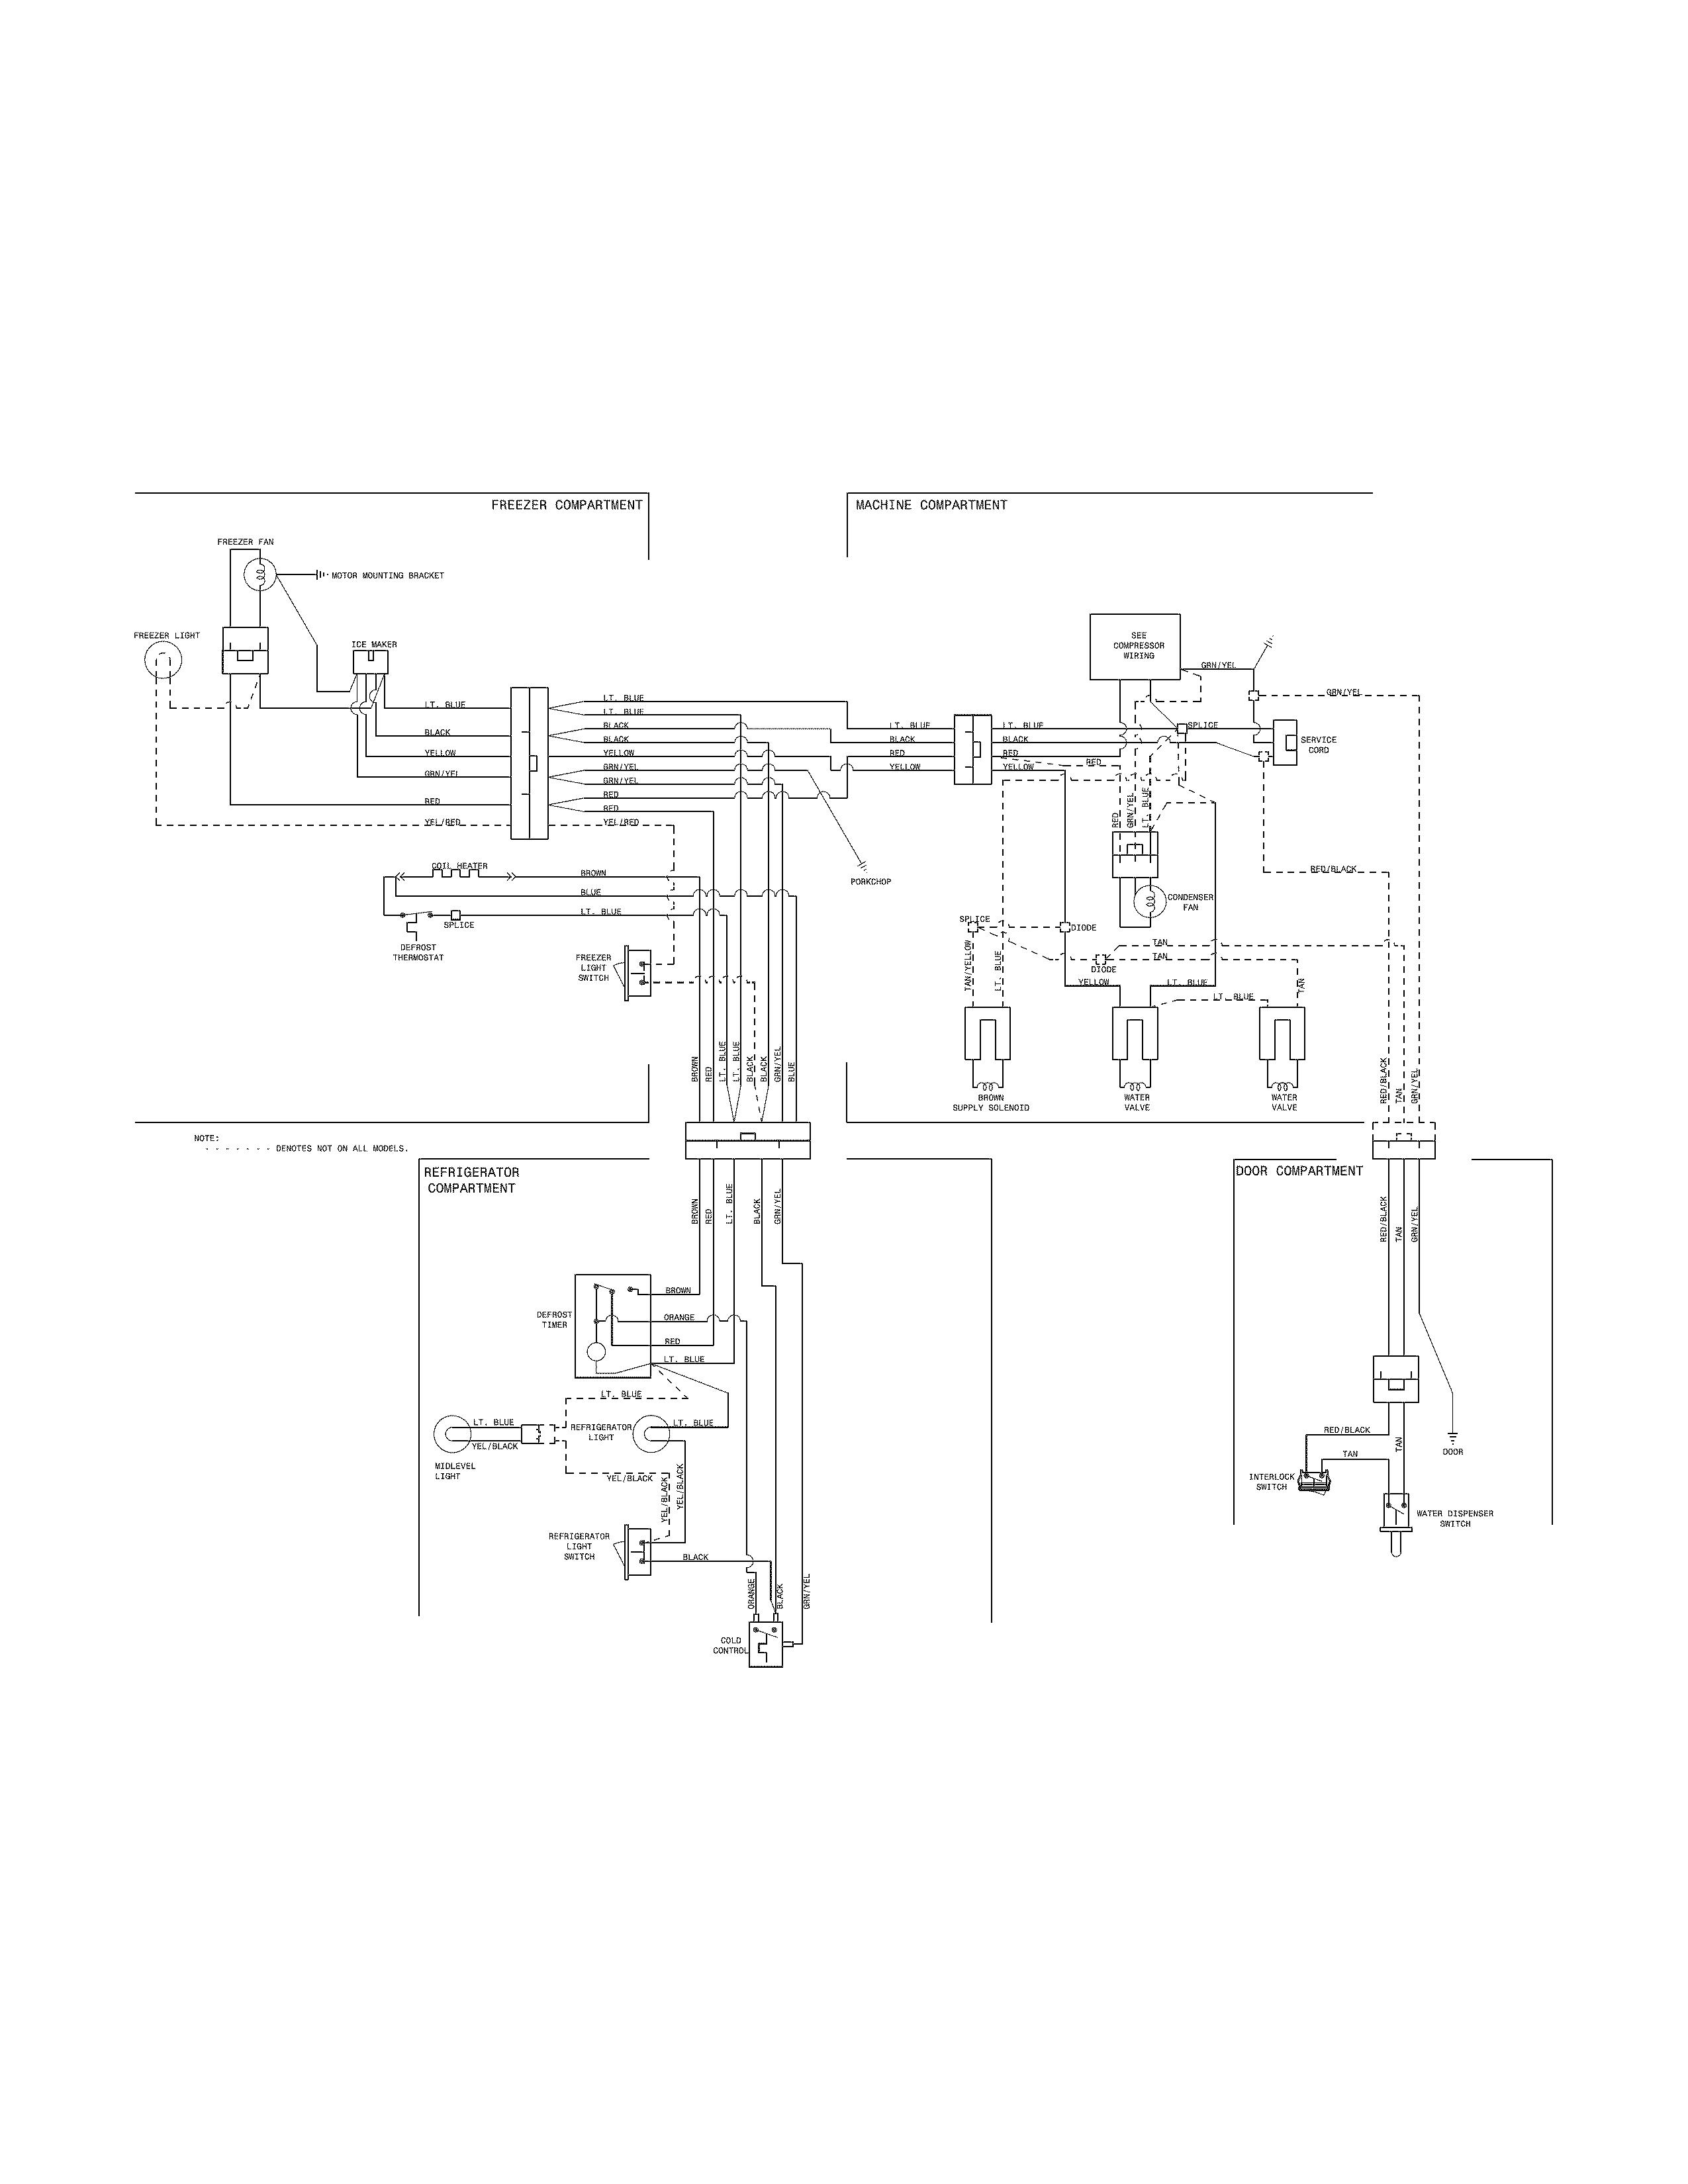 DIAGRAM] Wiring Traulsen Diagrams T34904c10 FULL Version HD Quality Diagrams  T34904c10 - DIAGRAMLAND.ARKIS.ITarkis.it